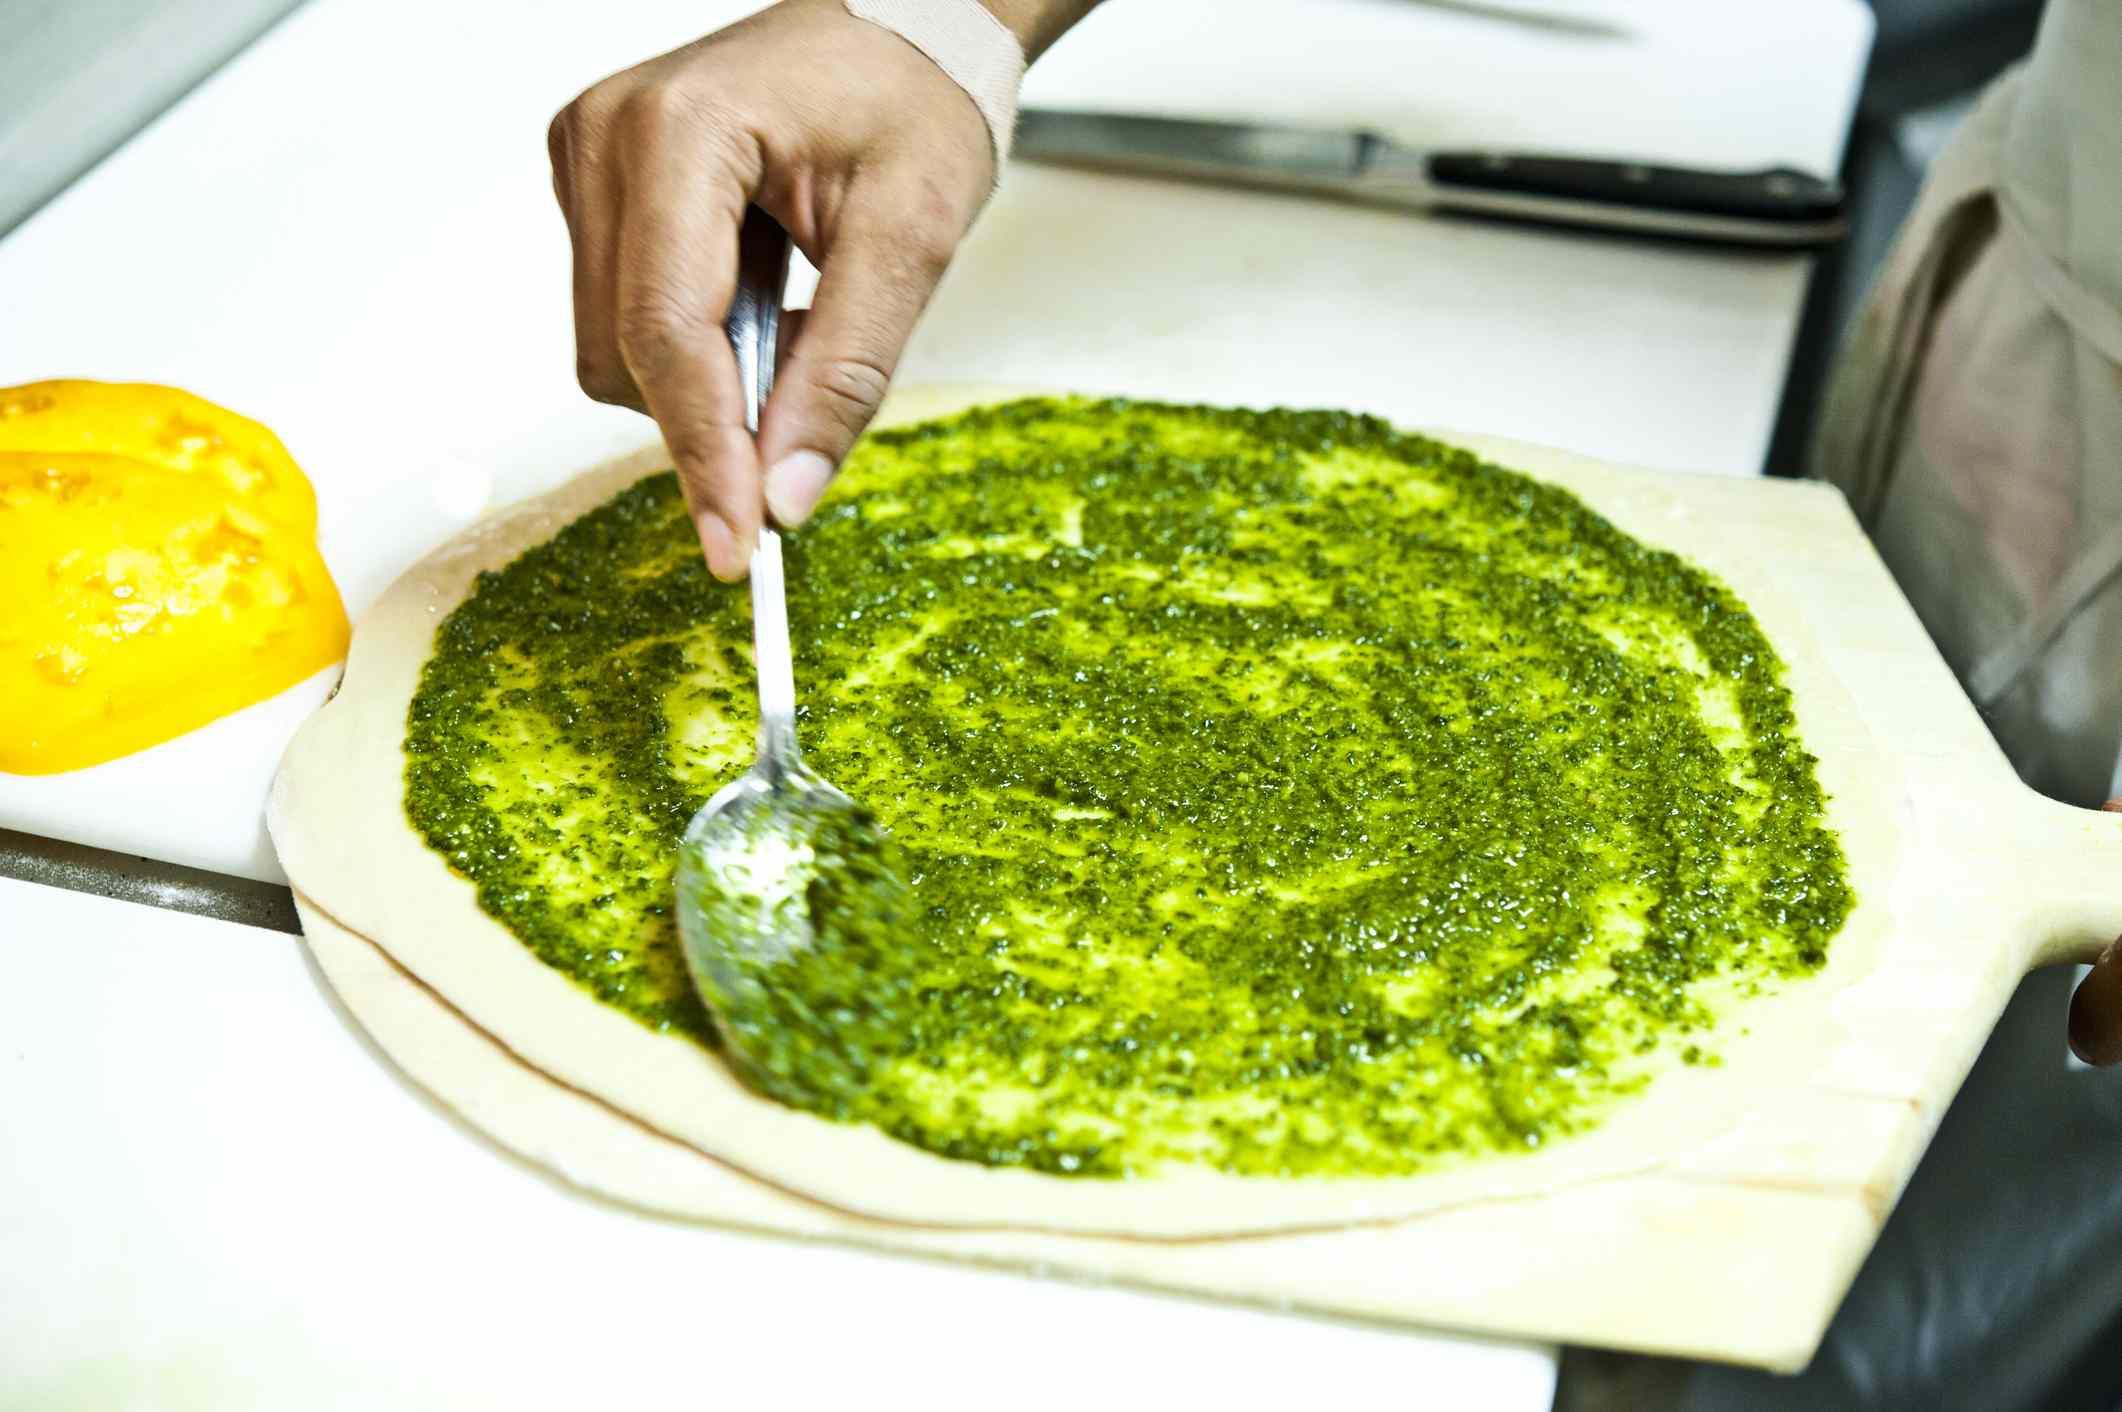 Pesto spread onto pizza dough